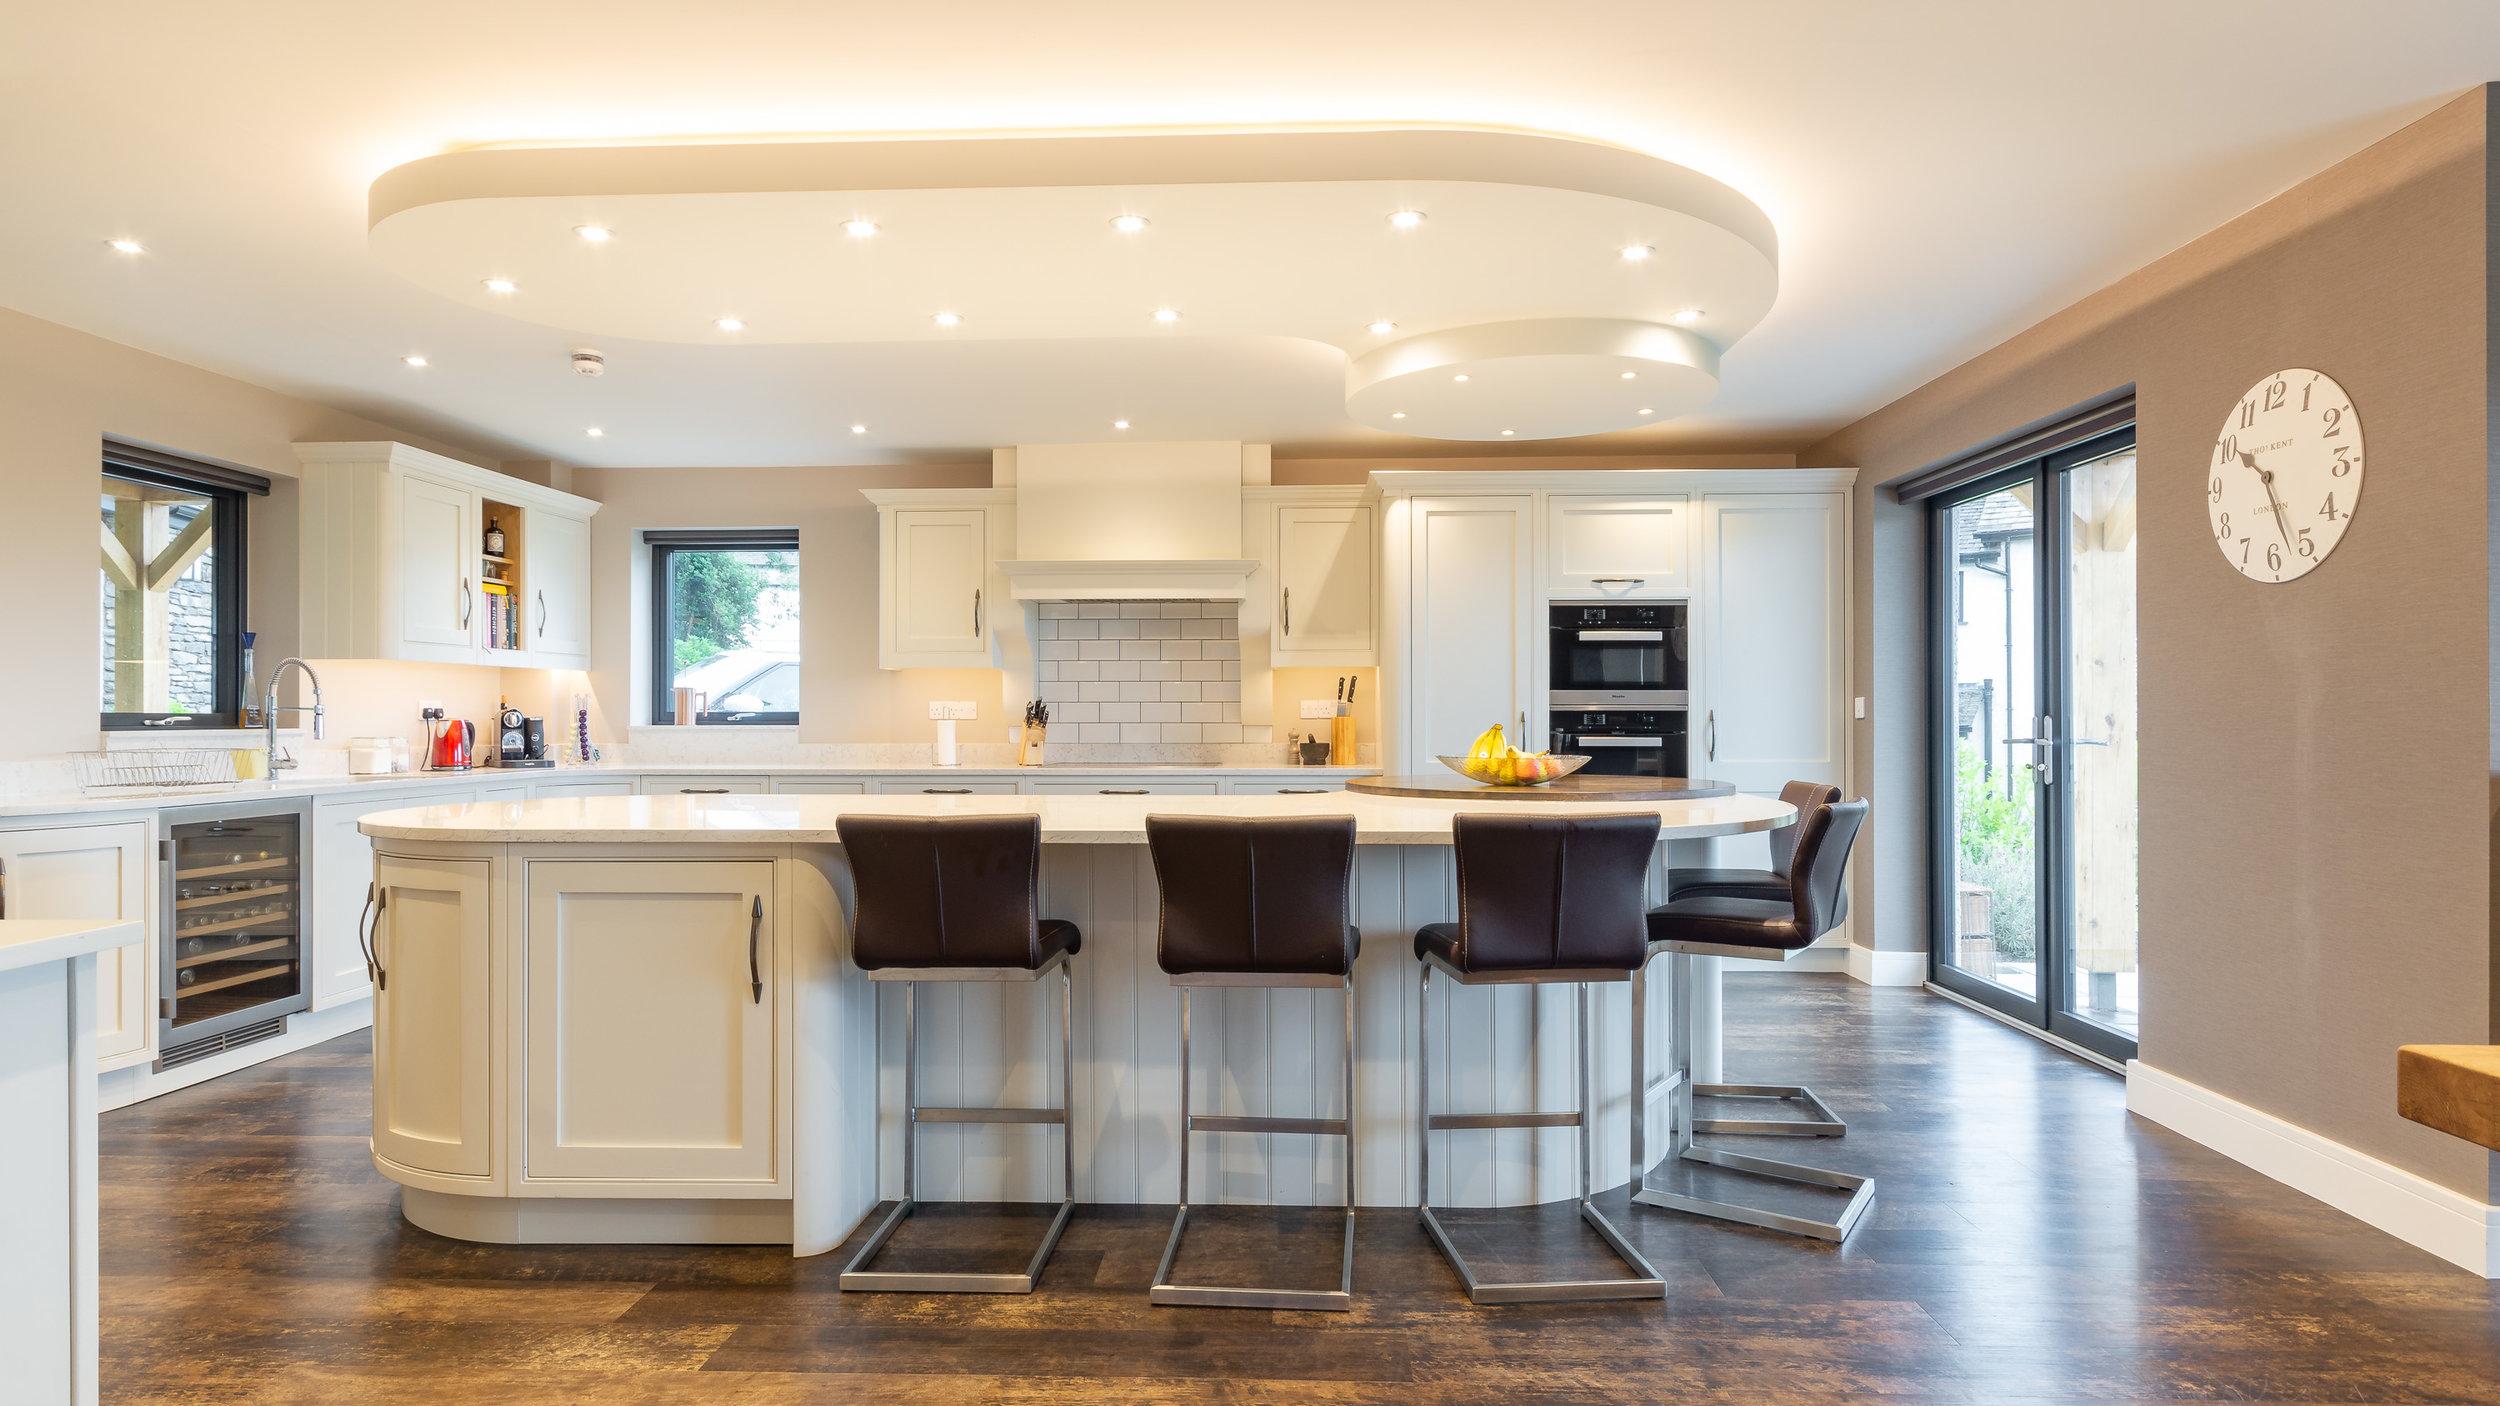 Webbs-Kitchens-Aimee-Curtin--4.jpg